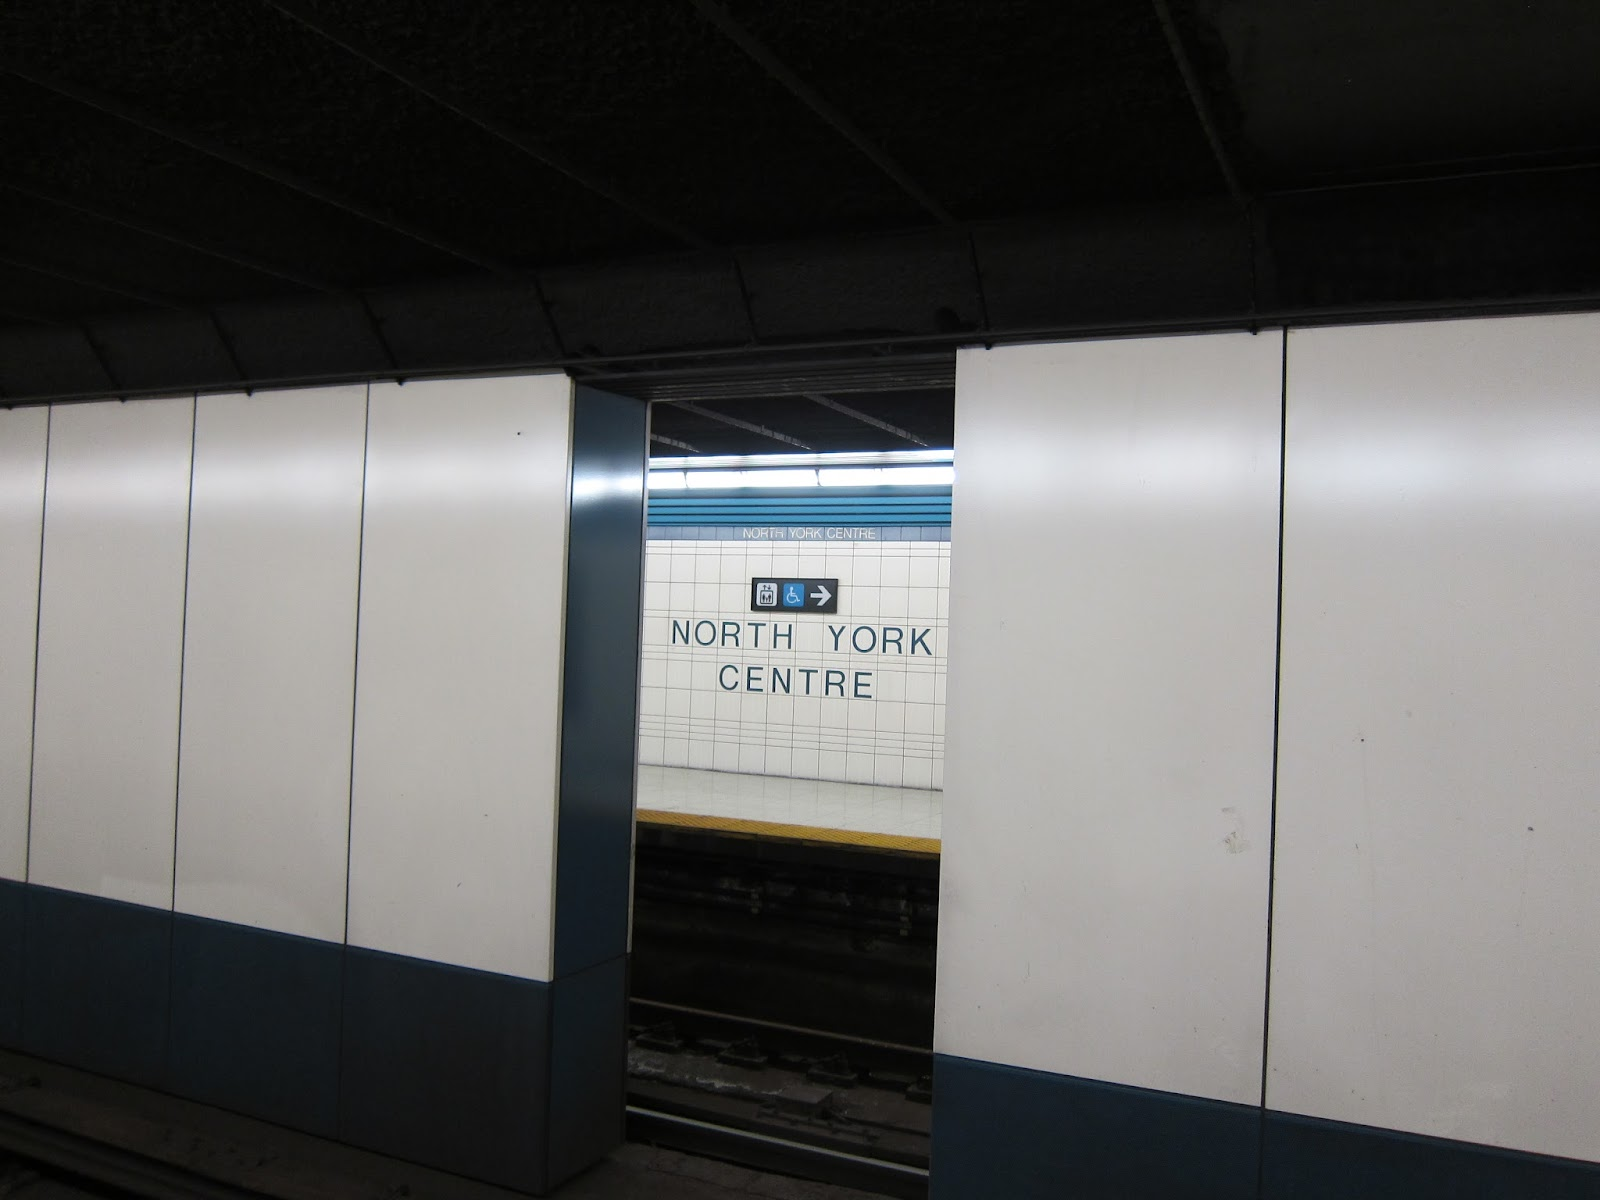 Support walls at North York Centre subway station